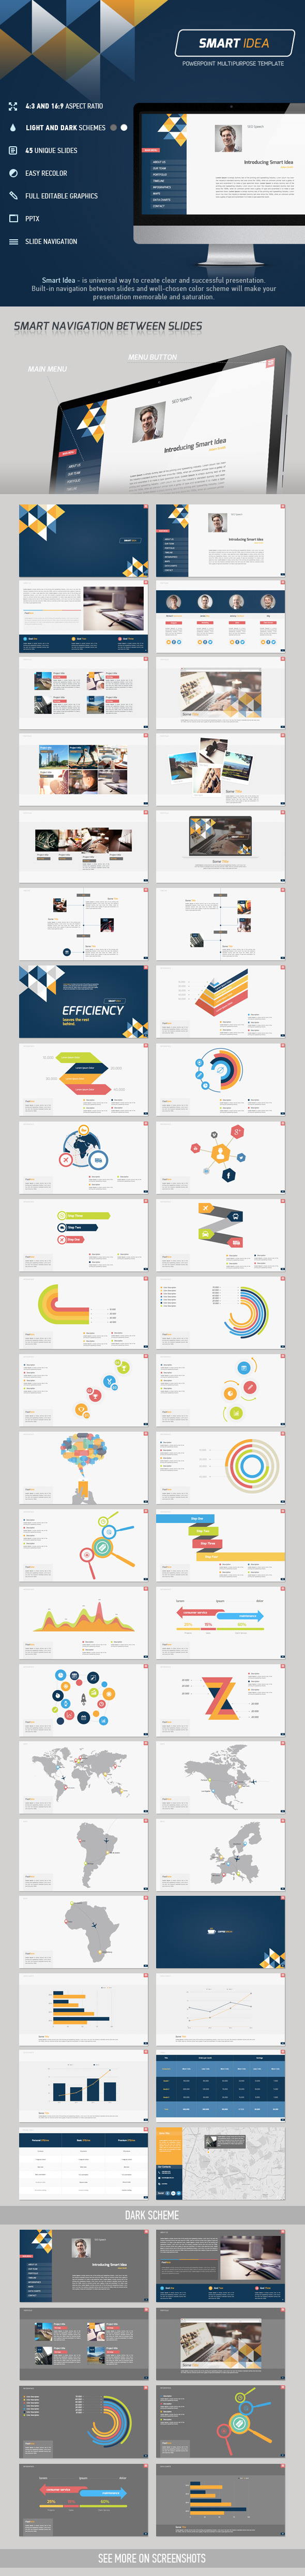 Smart Idea PowerPoint Template - Creative PowerPoint Templates